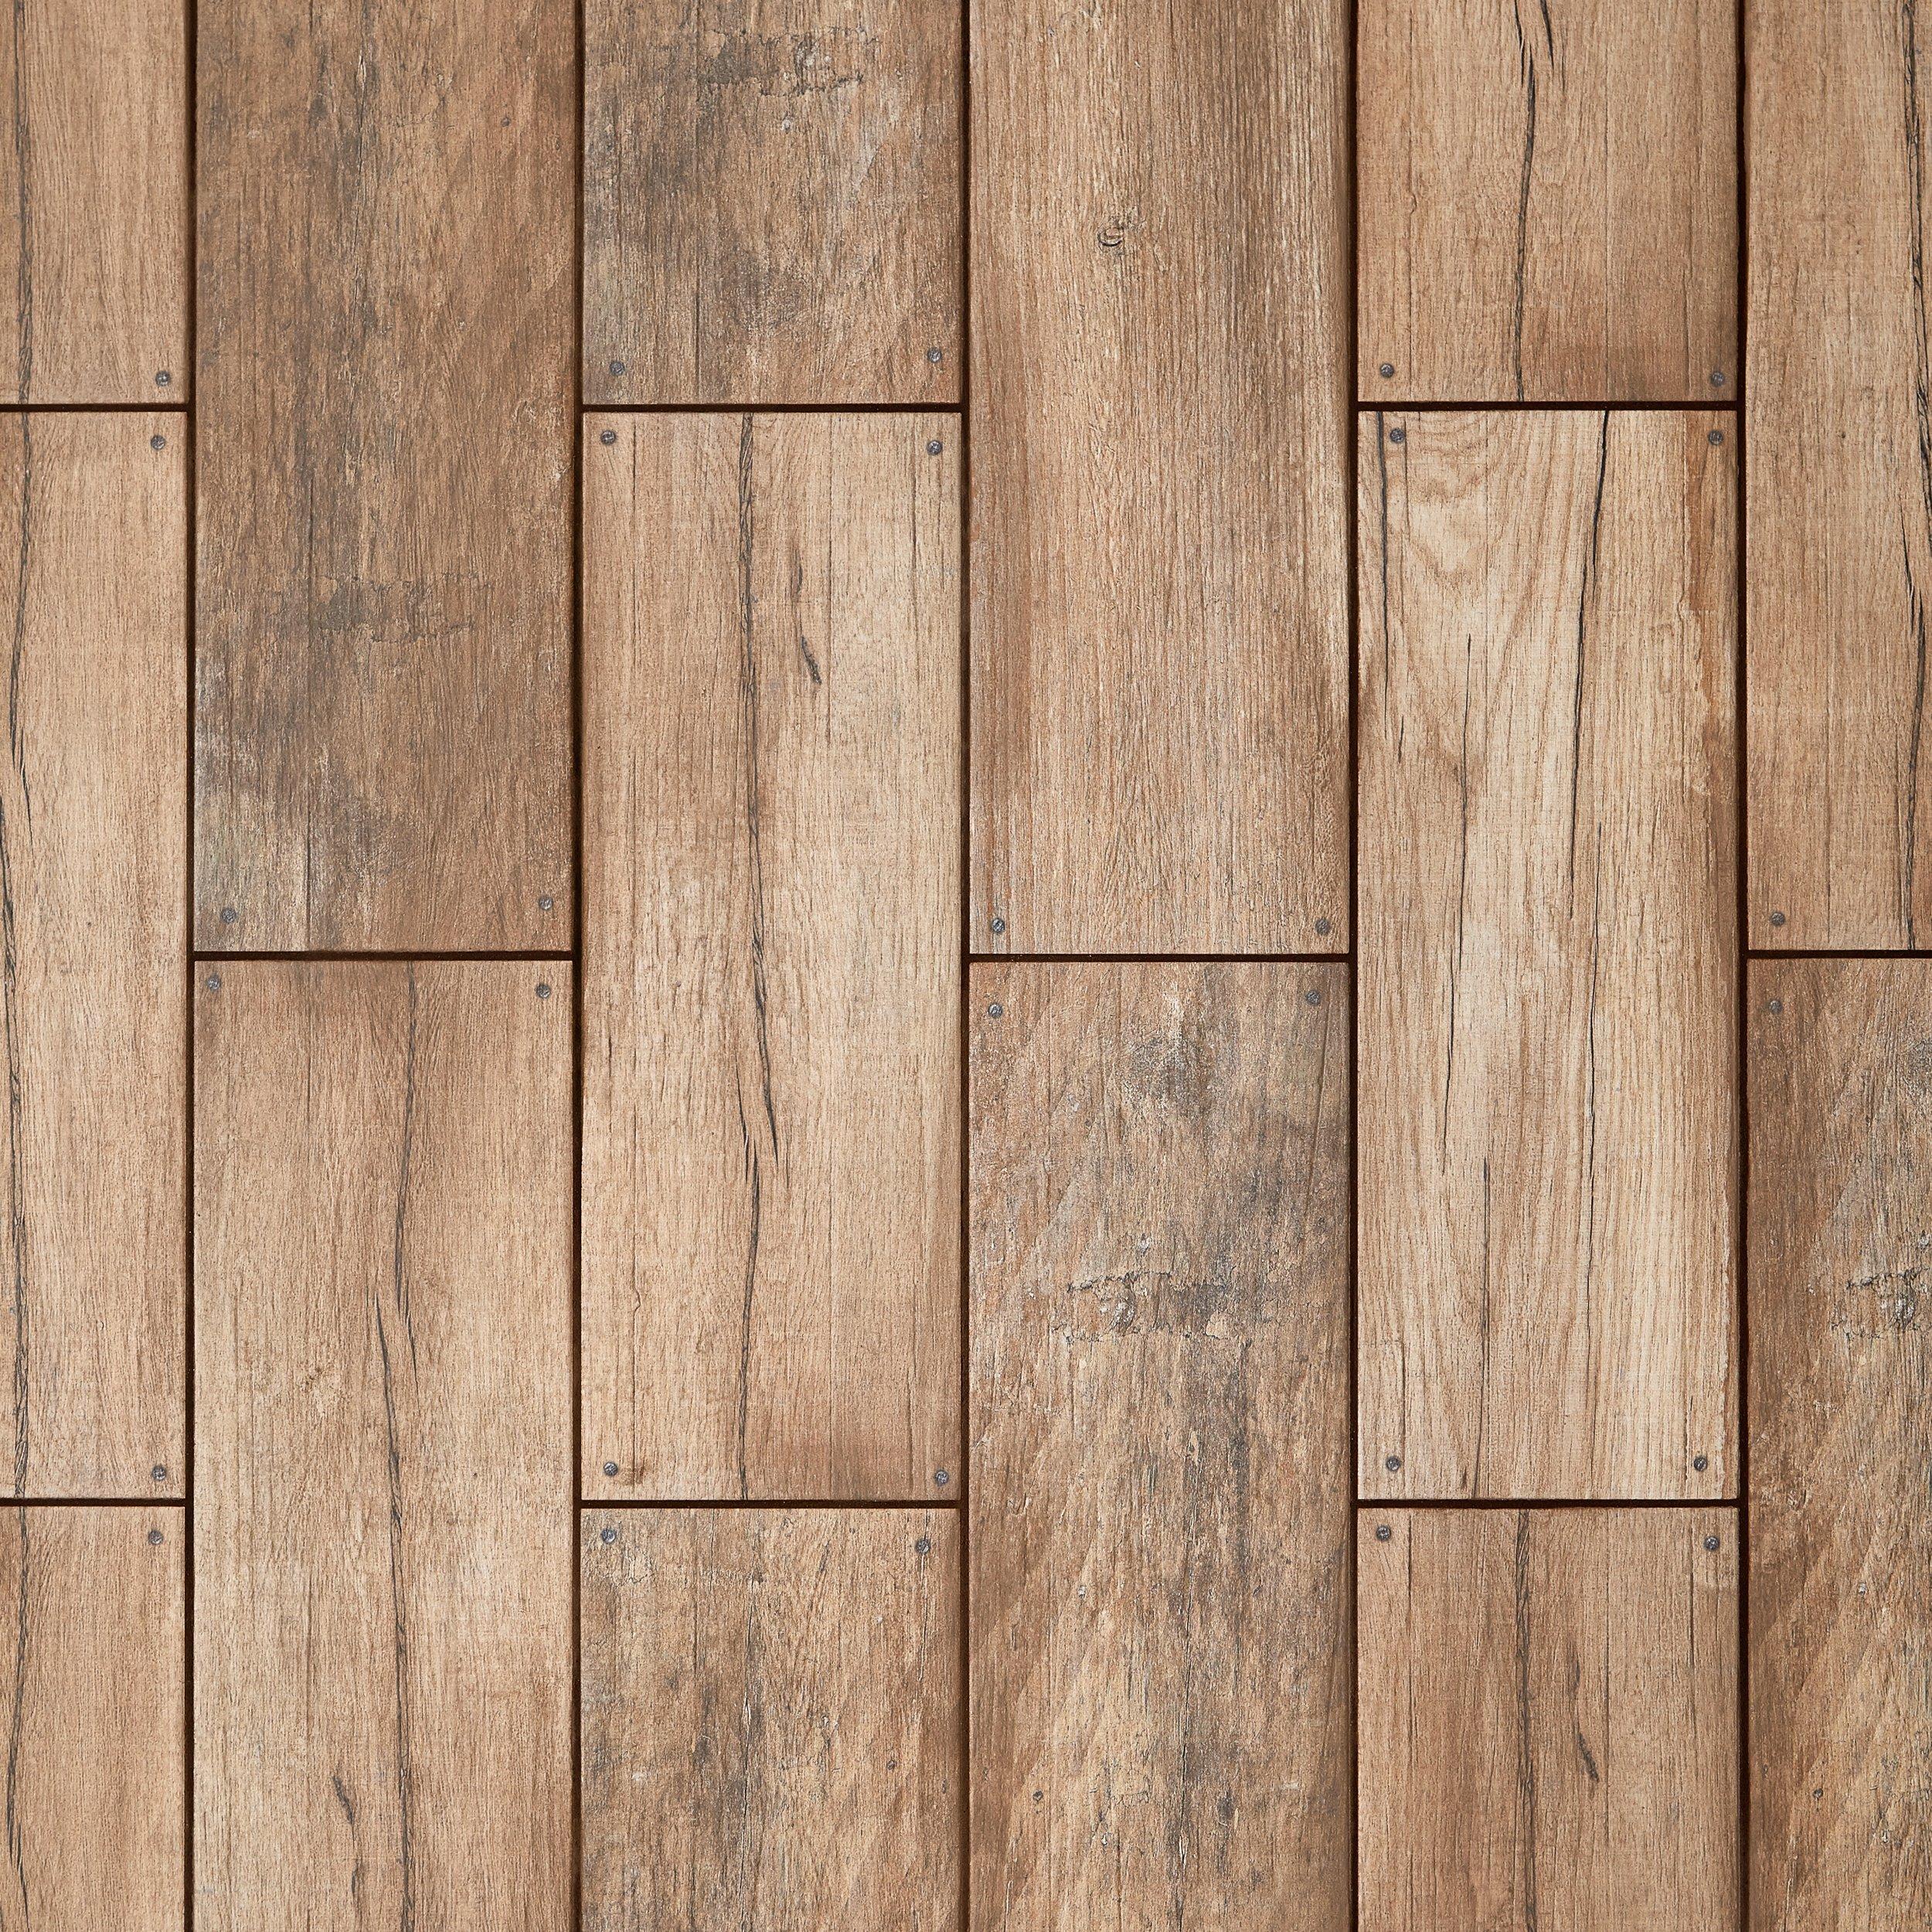 Saman Roble Wood Plank Ceramic Tile 7 X 20 100085455 Floor And